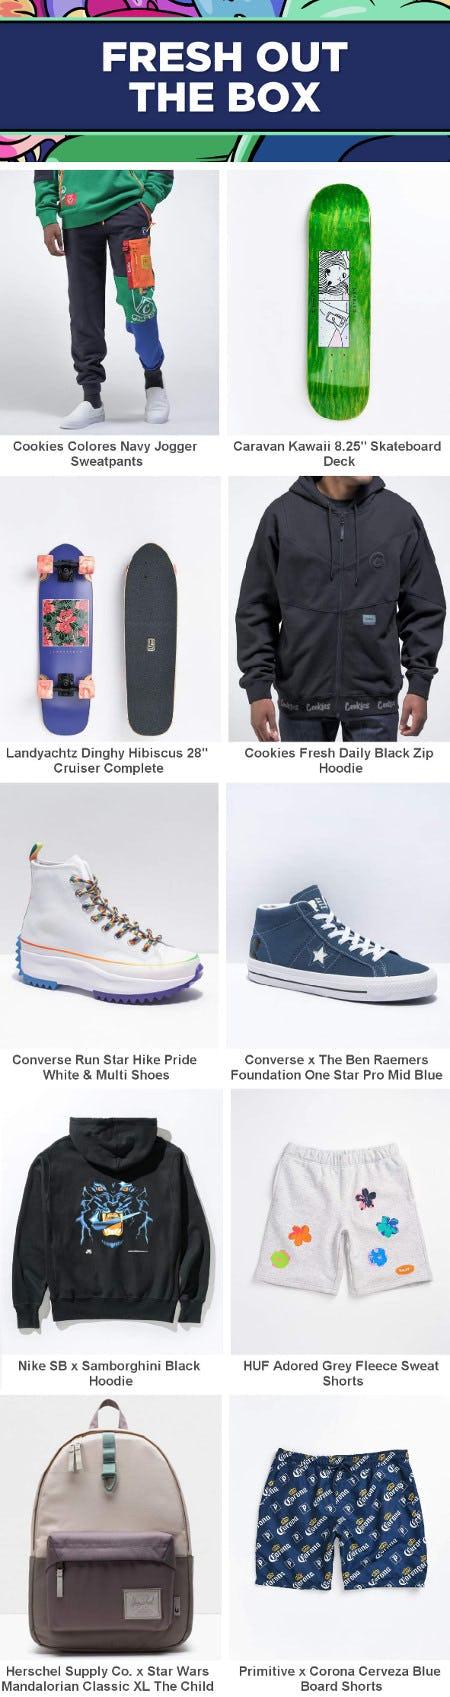 Shop New Arrivals from Zumiez